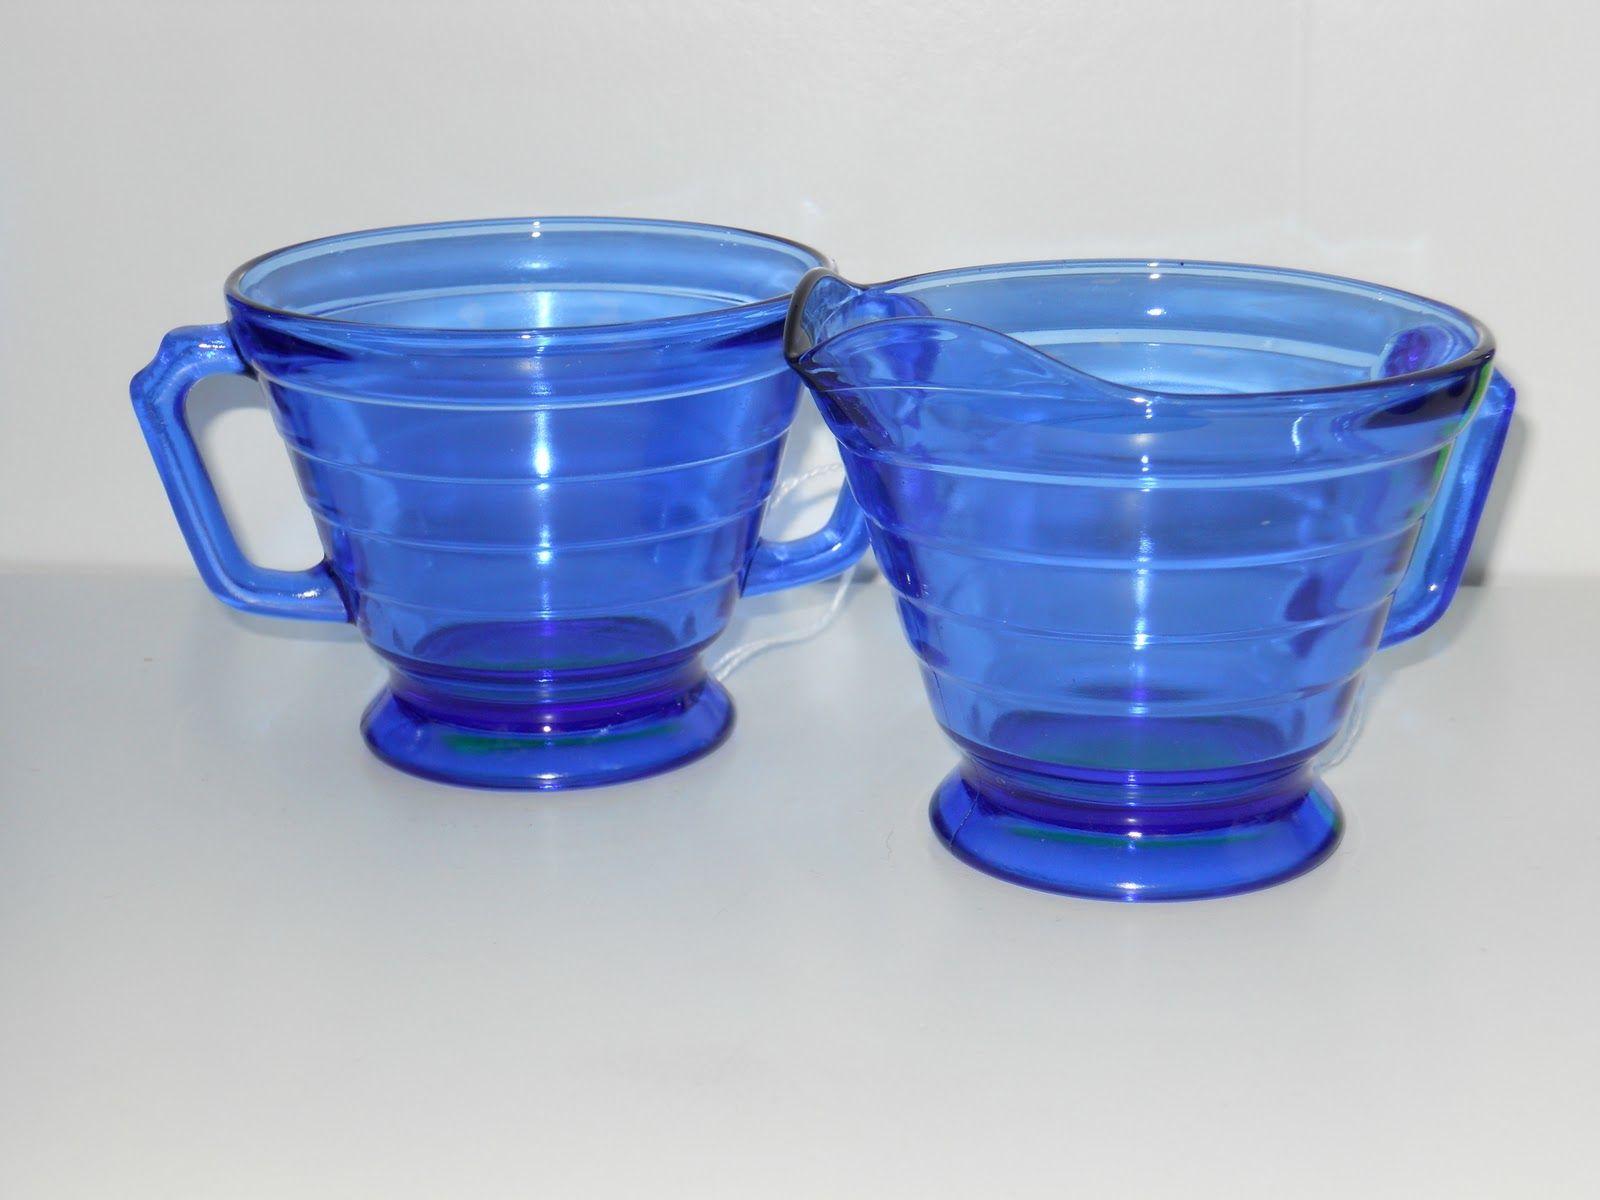 blue sugar and creamer